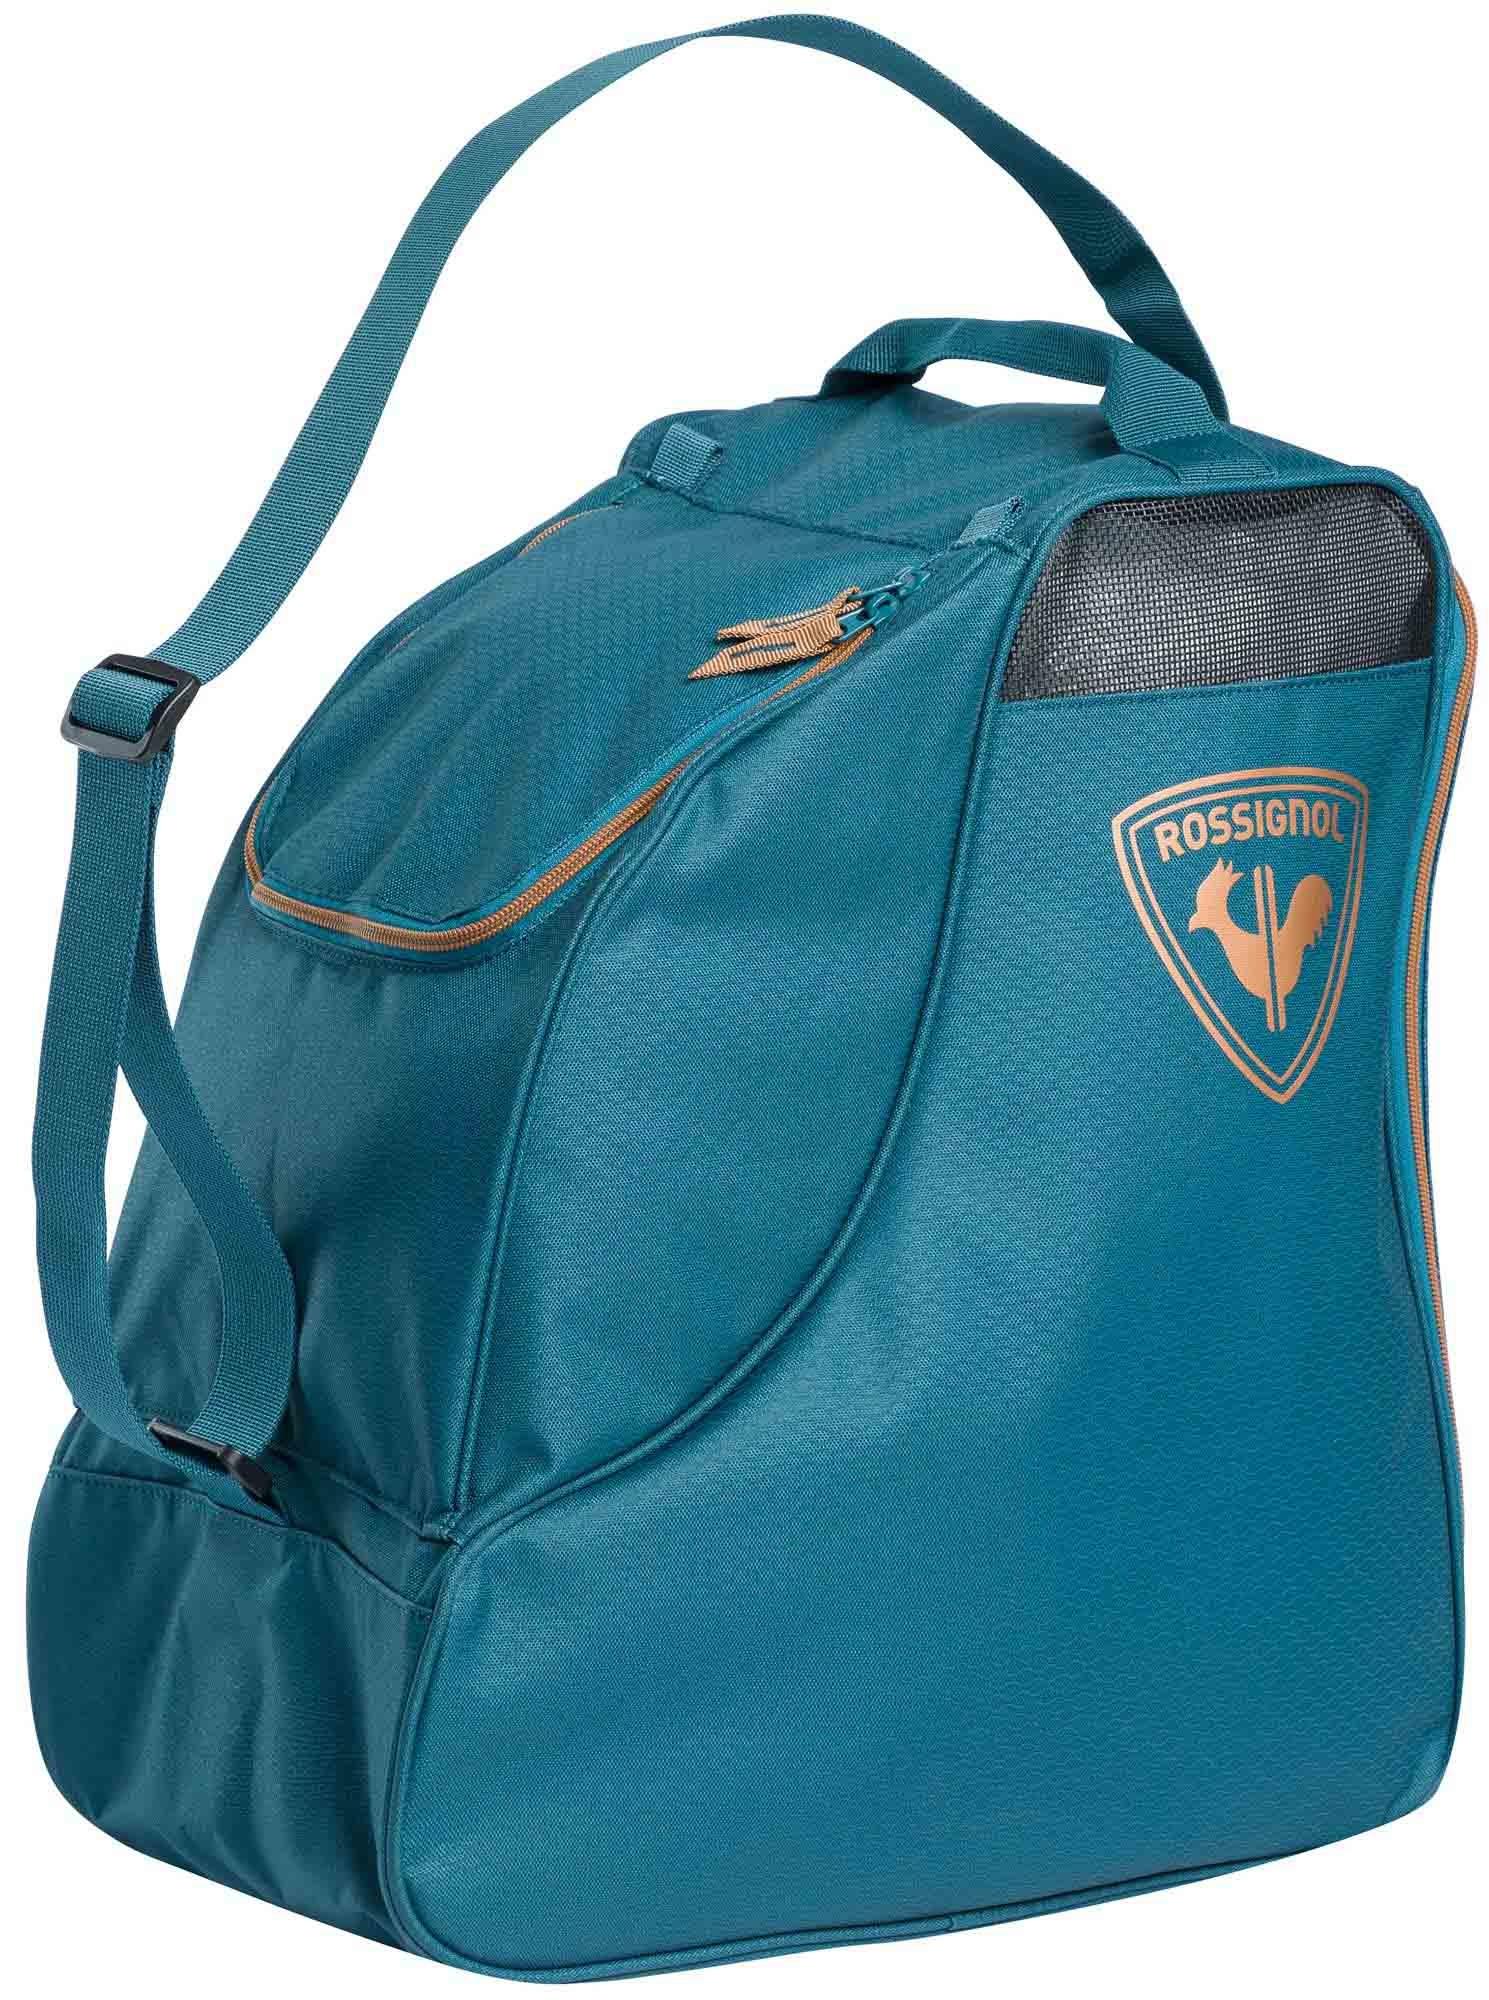 Rossignol Electra Boot Bag-1